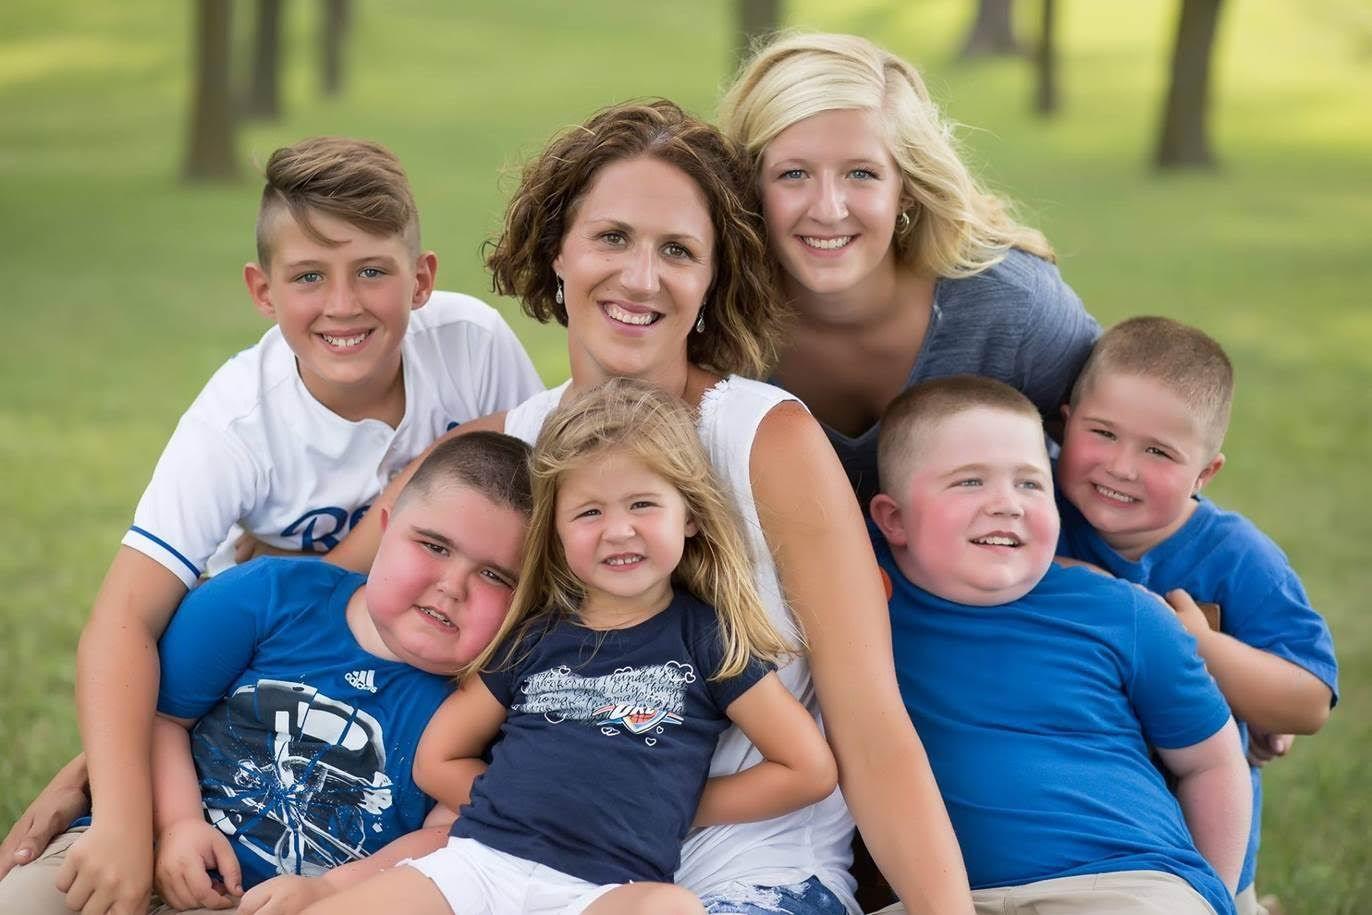 The Vertins Family